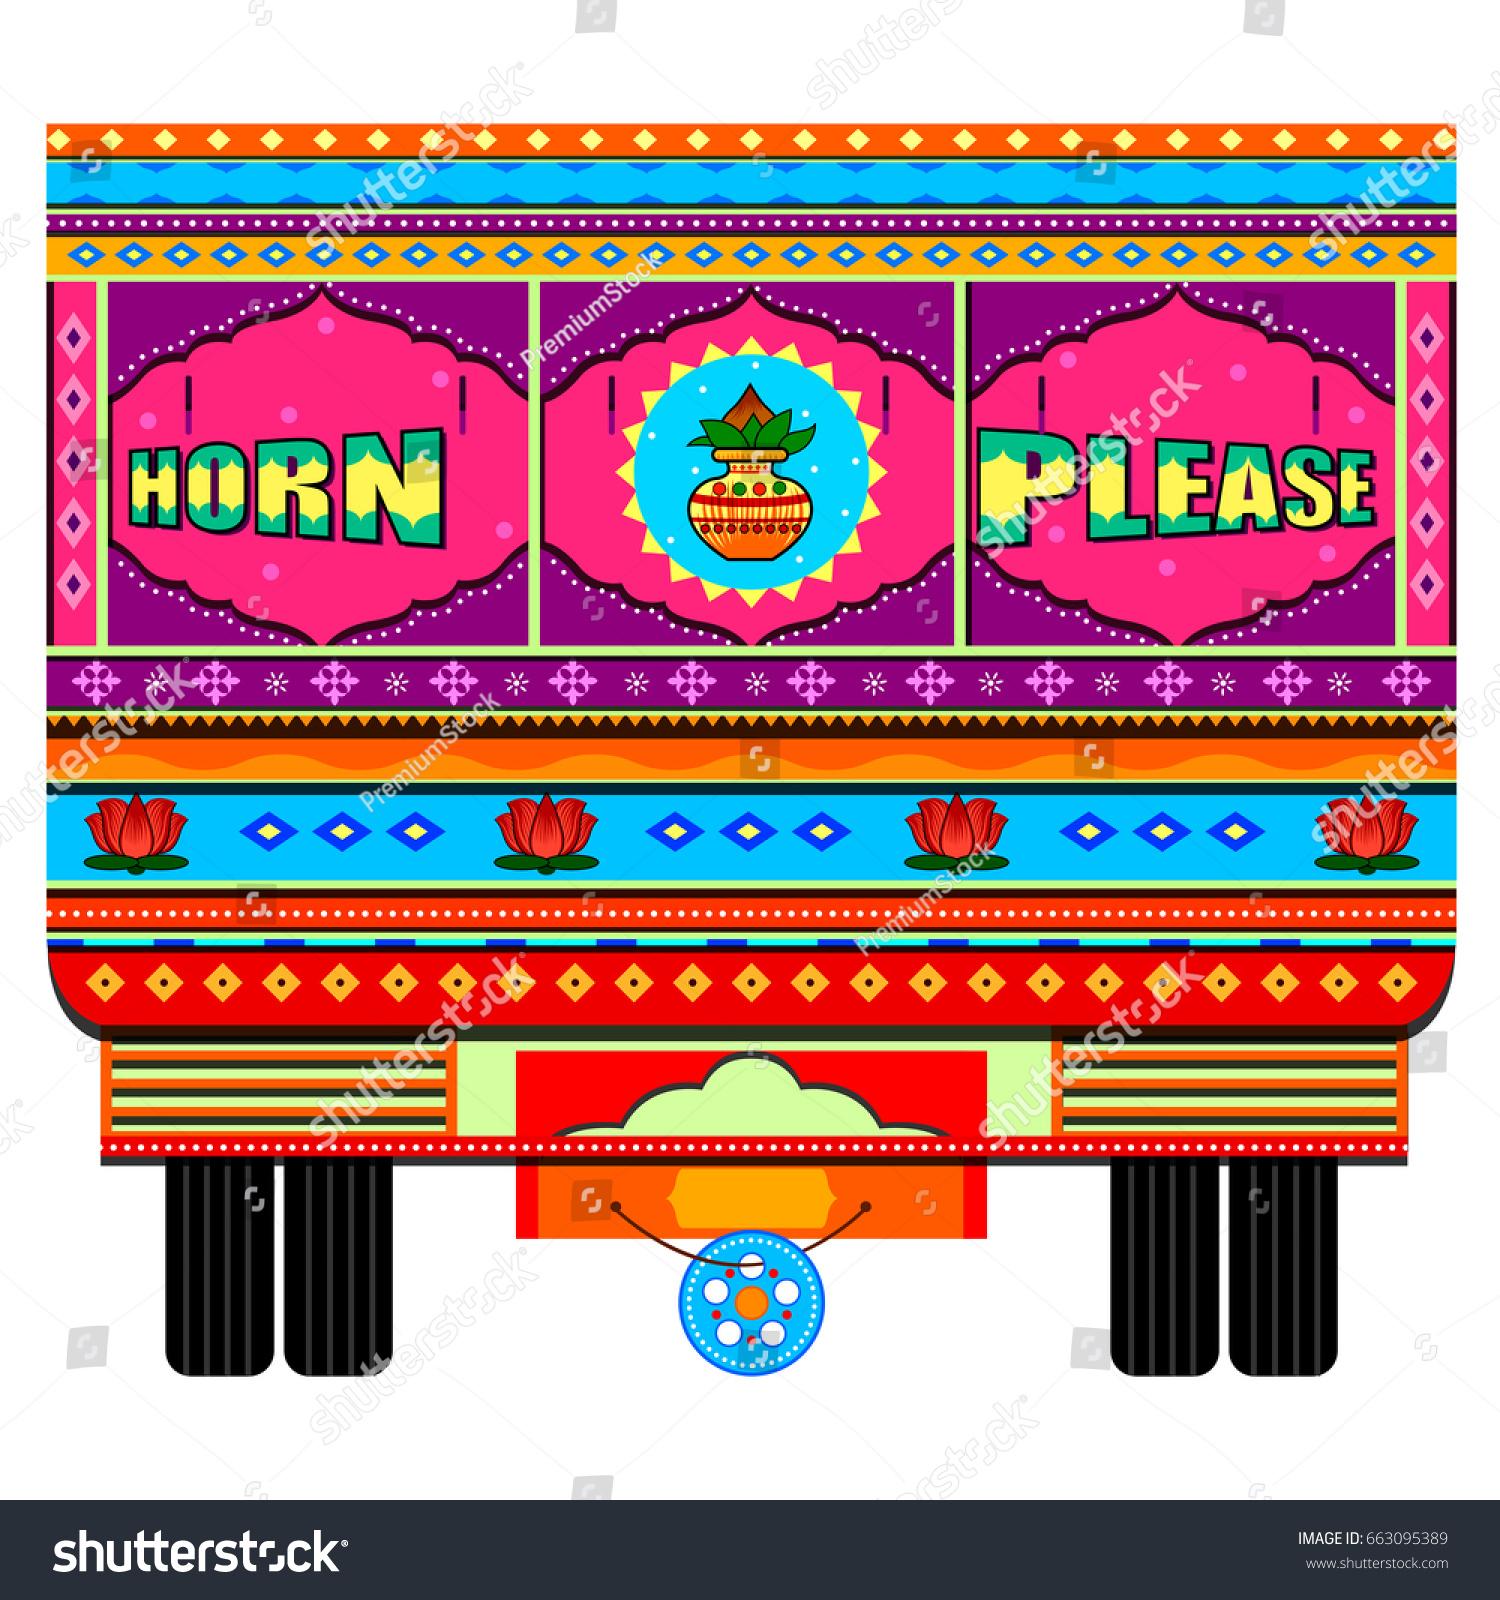 Vector Design Truck India Indian Art Stock Vector Royalty Free 663095389